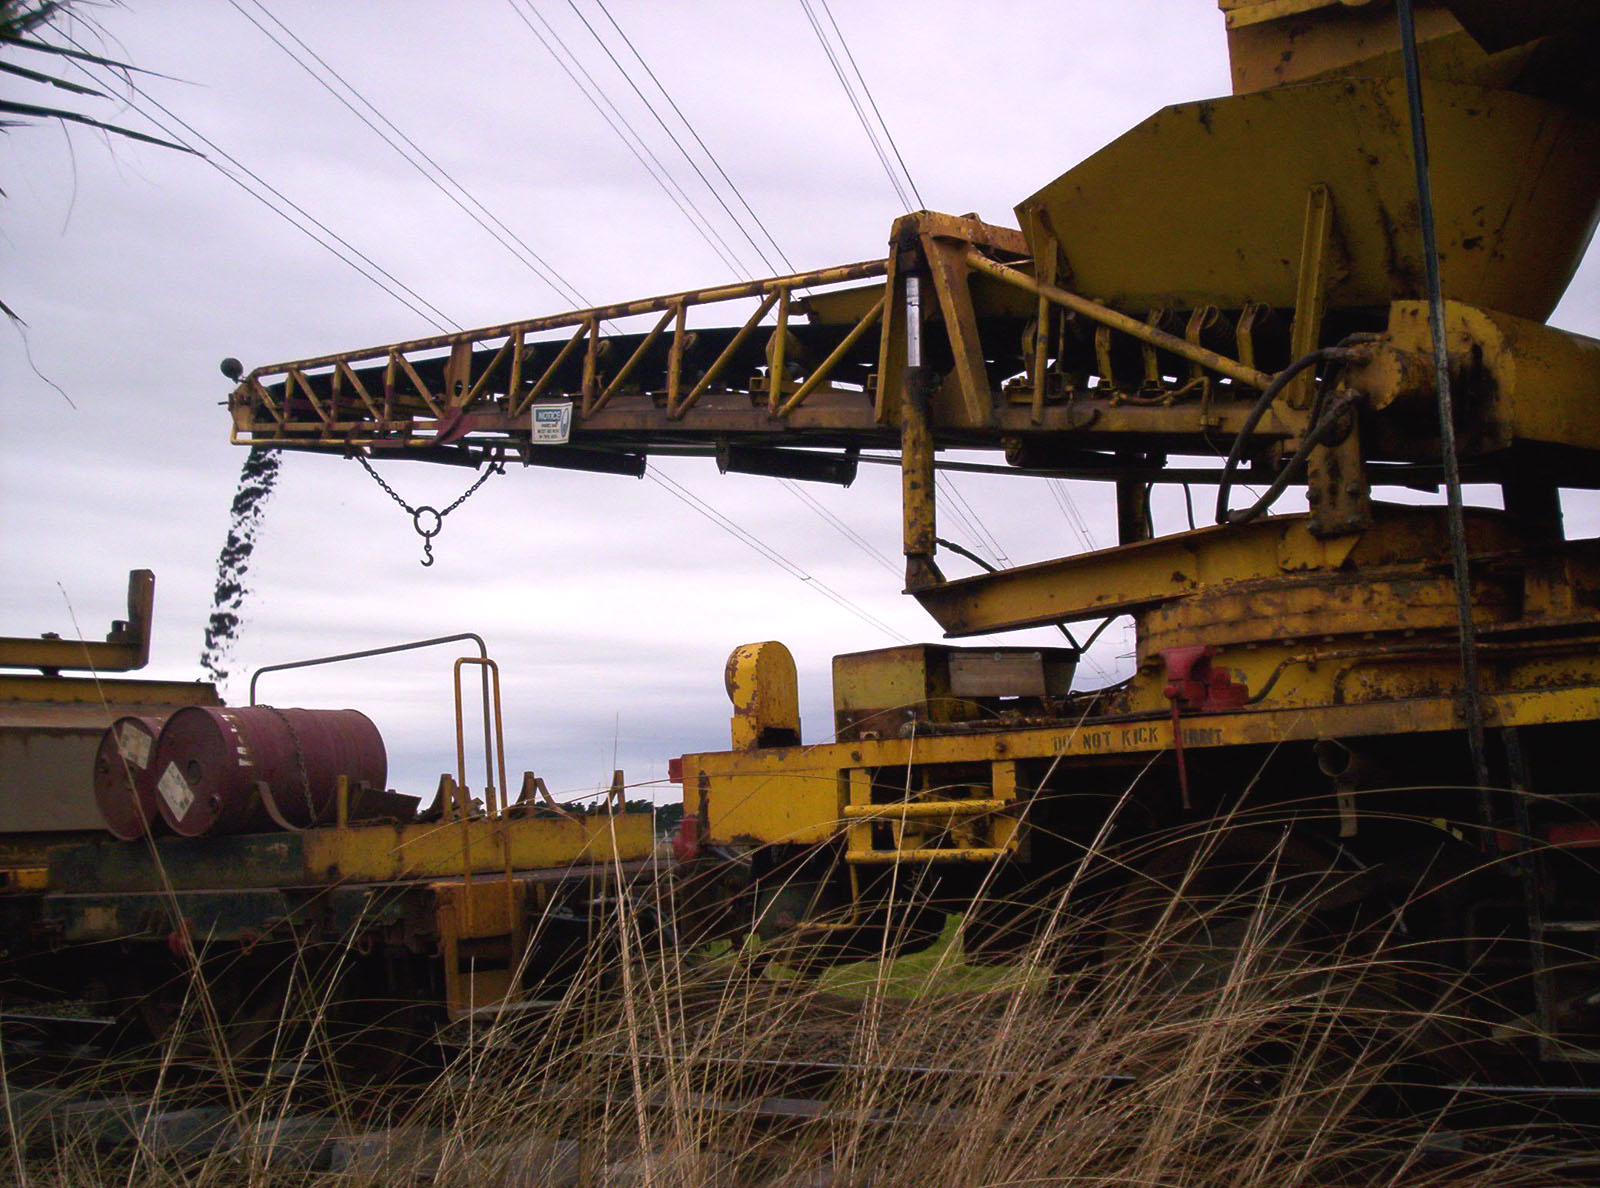 Railway Maintenance, Adjusting, Belt, Bspo06, Conveyor, HQ Photo